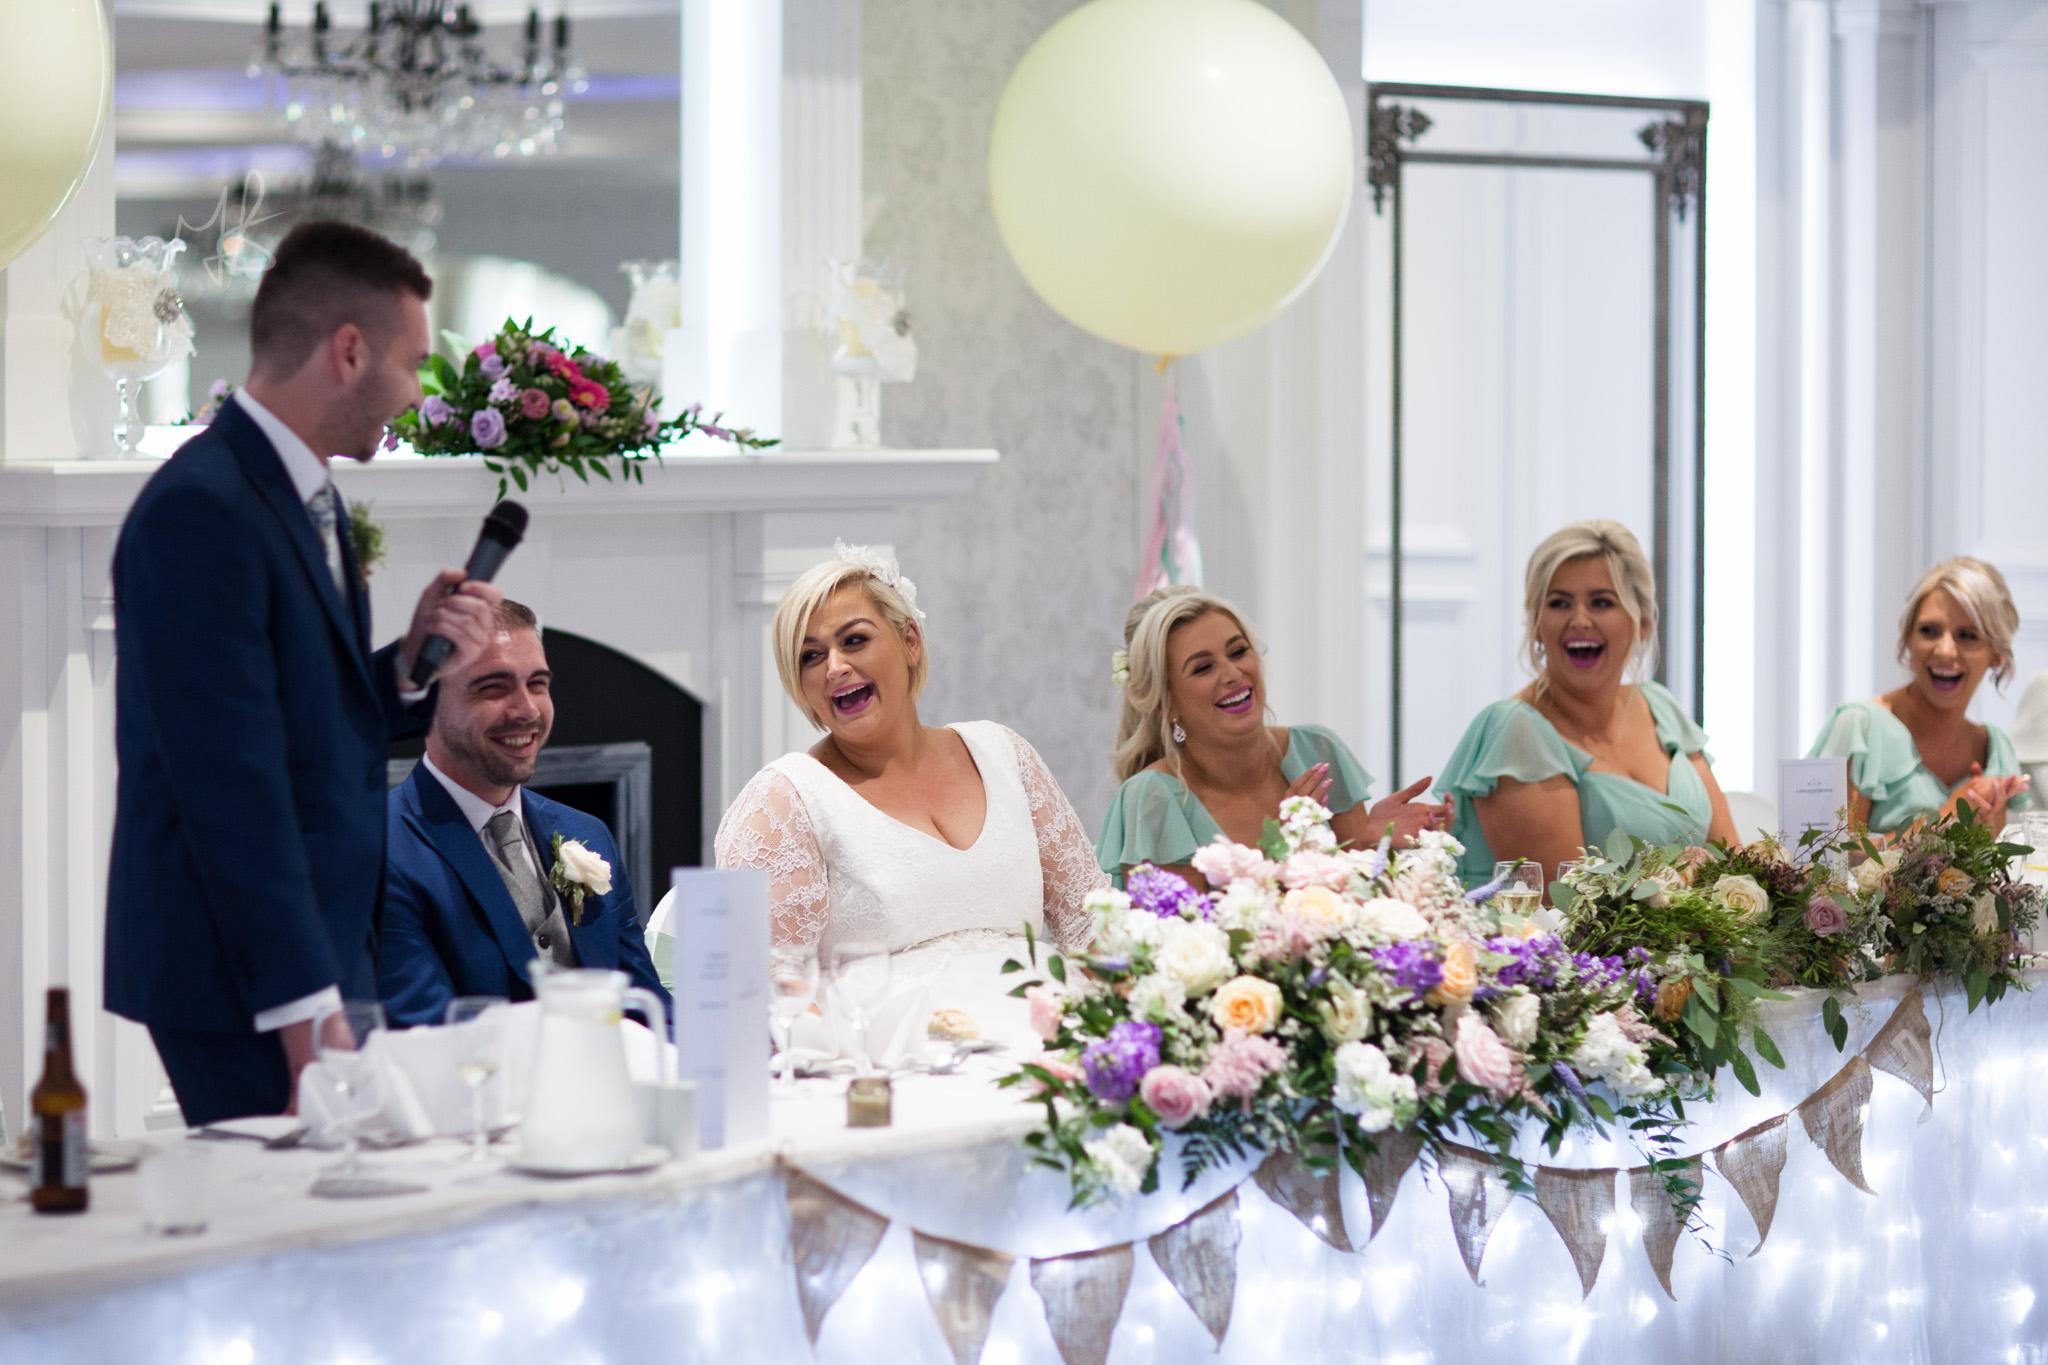 Northern-Ireland-Wedding-Photographer-Mark-Barnes-Ballymena_wedding-photography-Leighinmohr-House-Seamas_Alanna_For-web-44.jpg